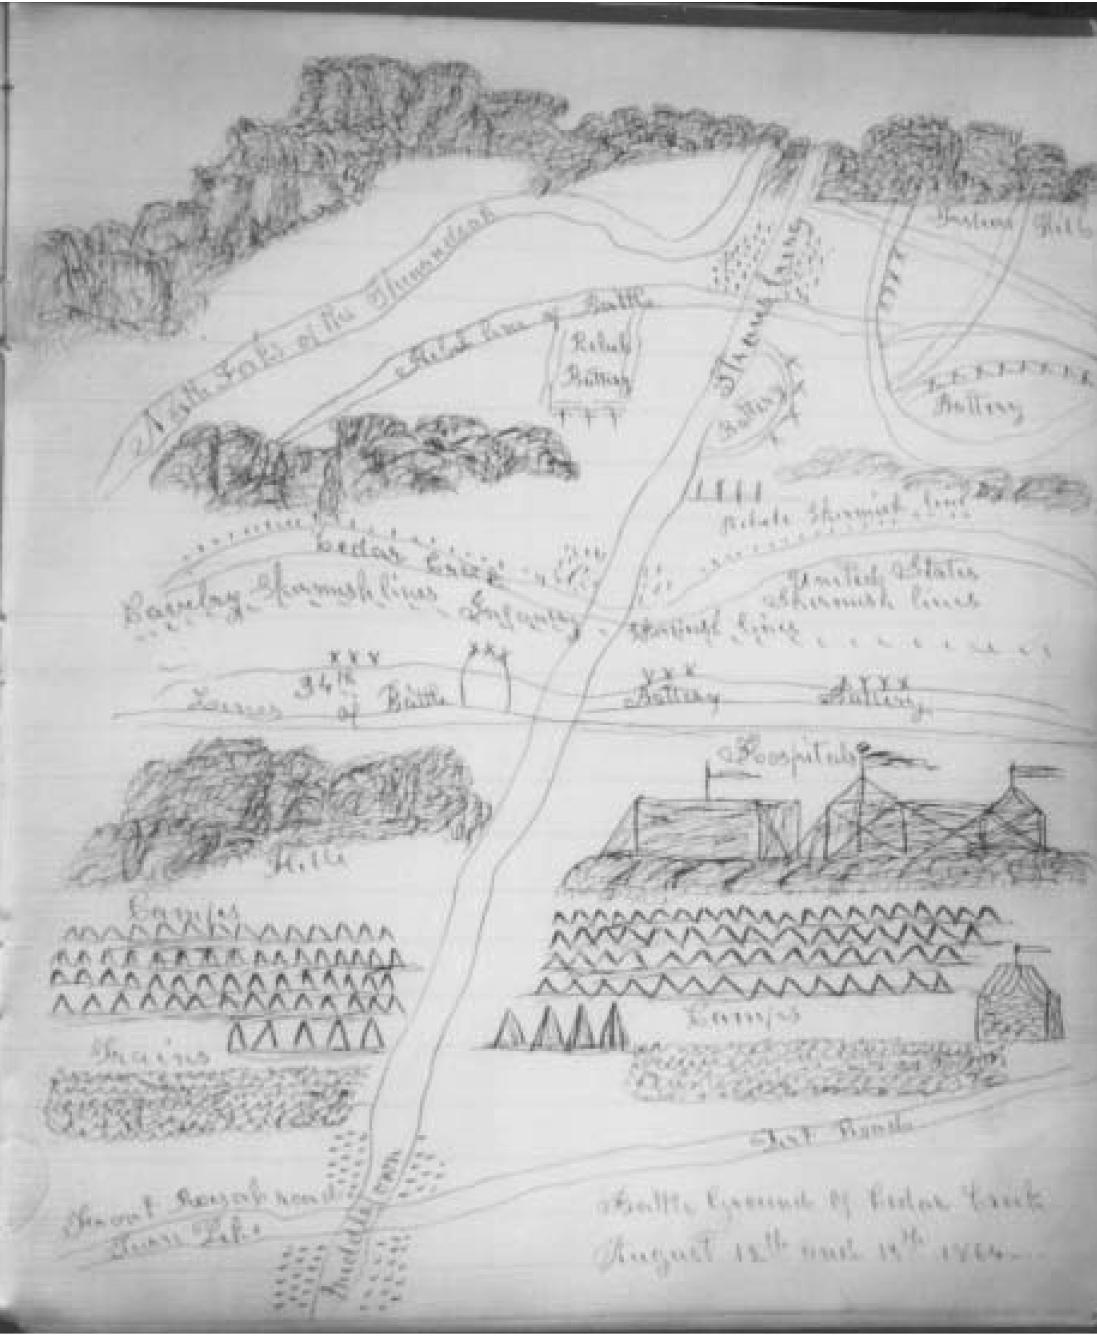 grievo civil war document-3.jpg